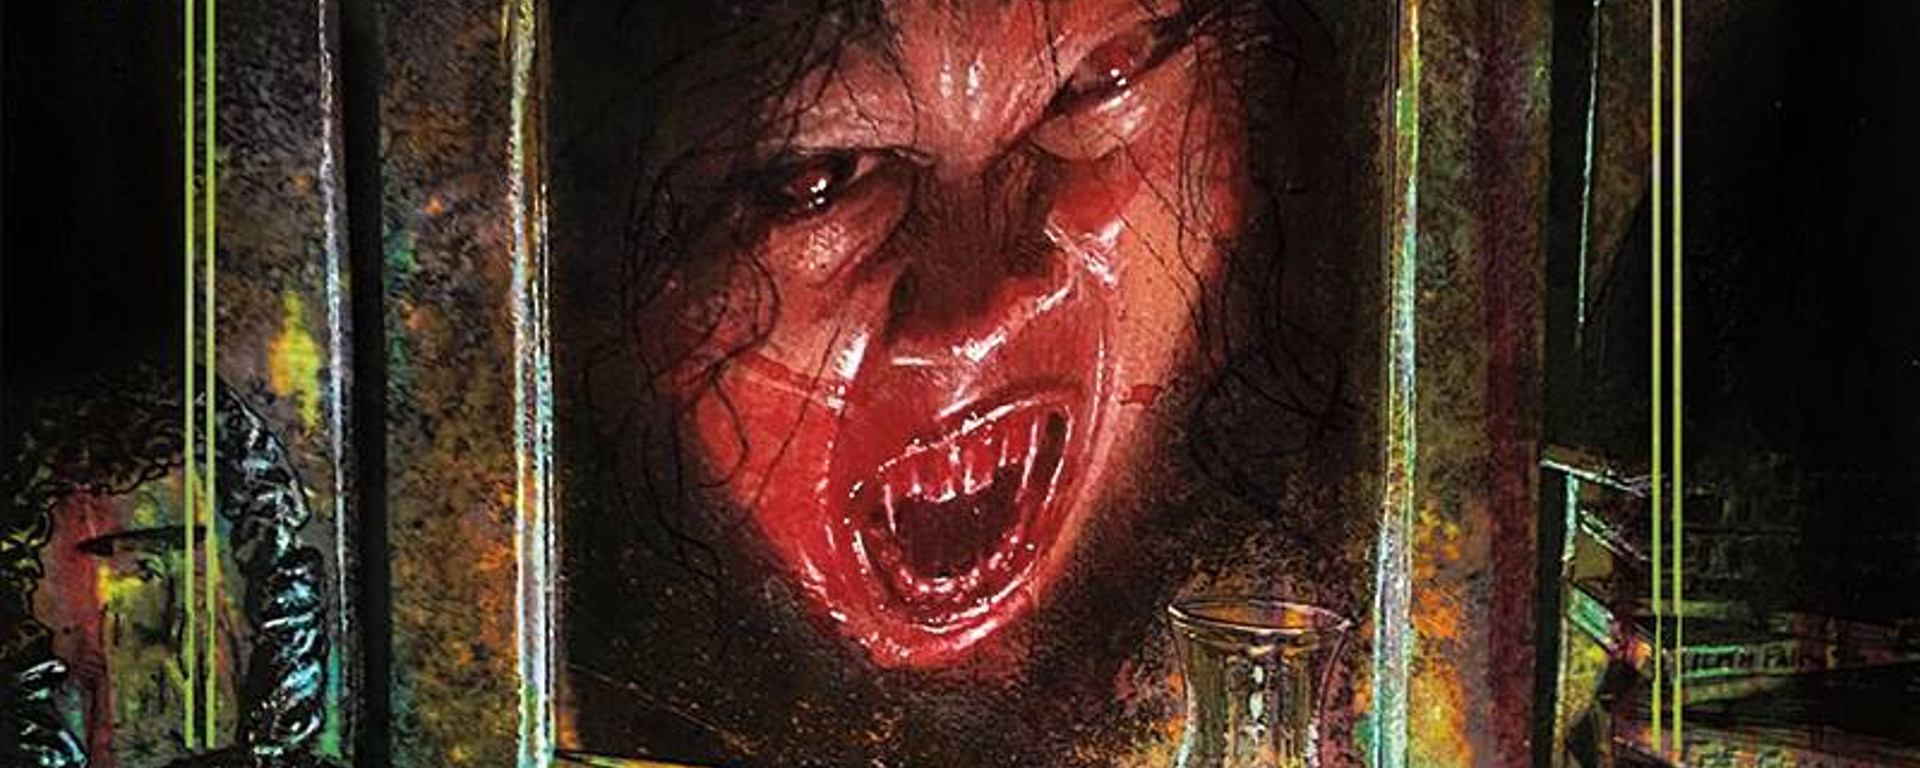 Vampire the Masquerade #6 Header